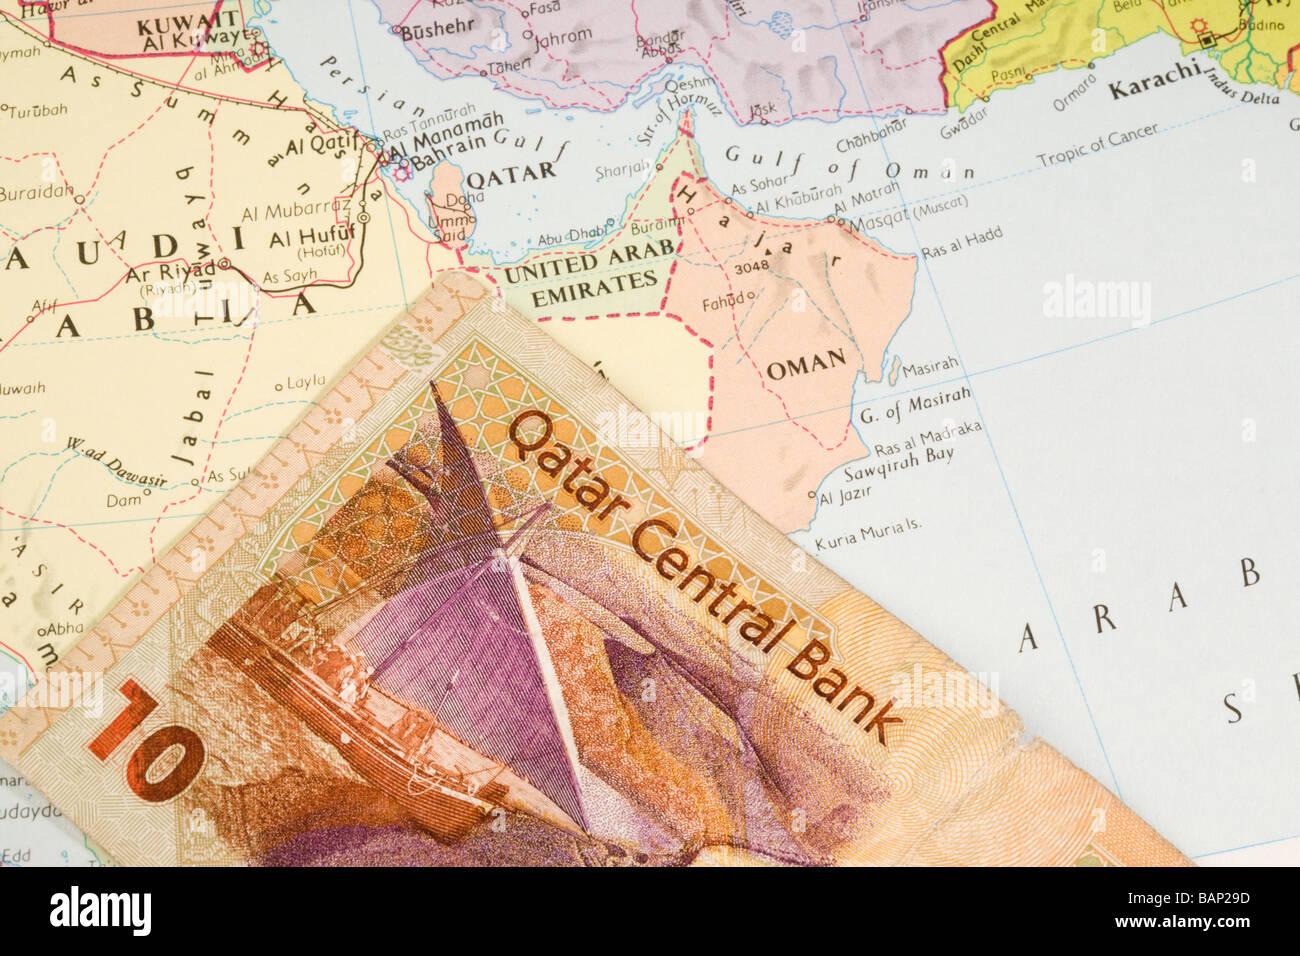 Map Of Qatar Stock Photos & Map Of Qatar Stock Images - Alamy Qatar Area Map on